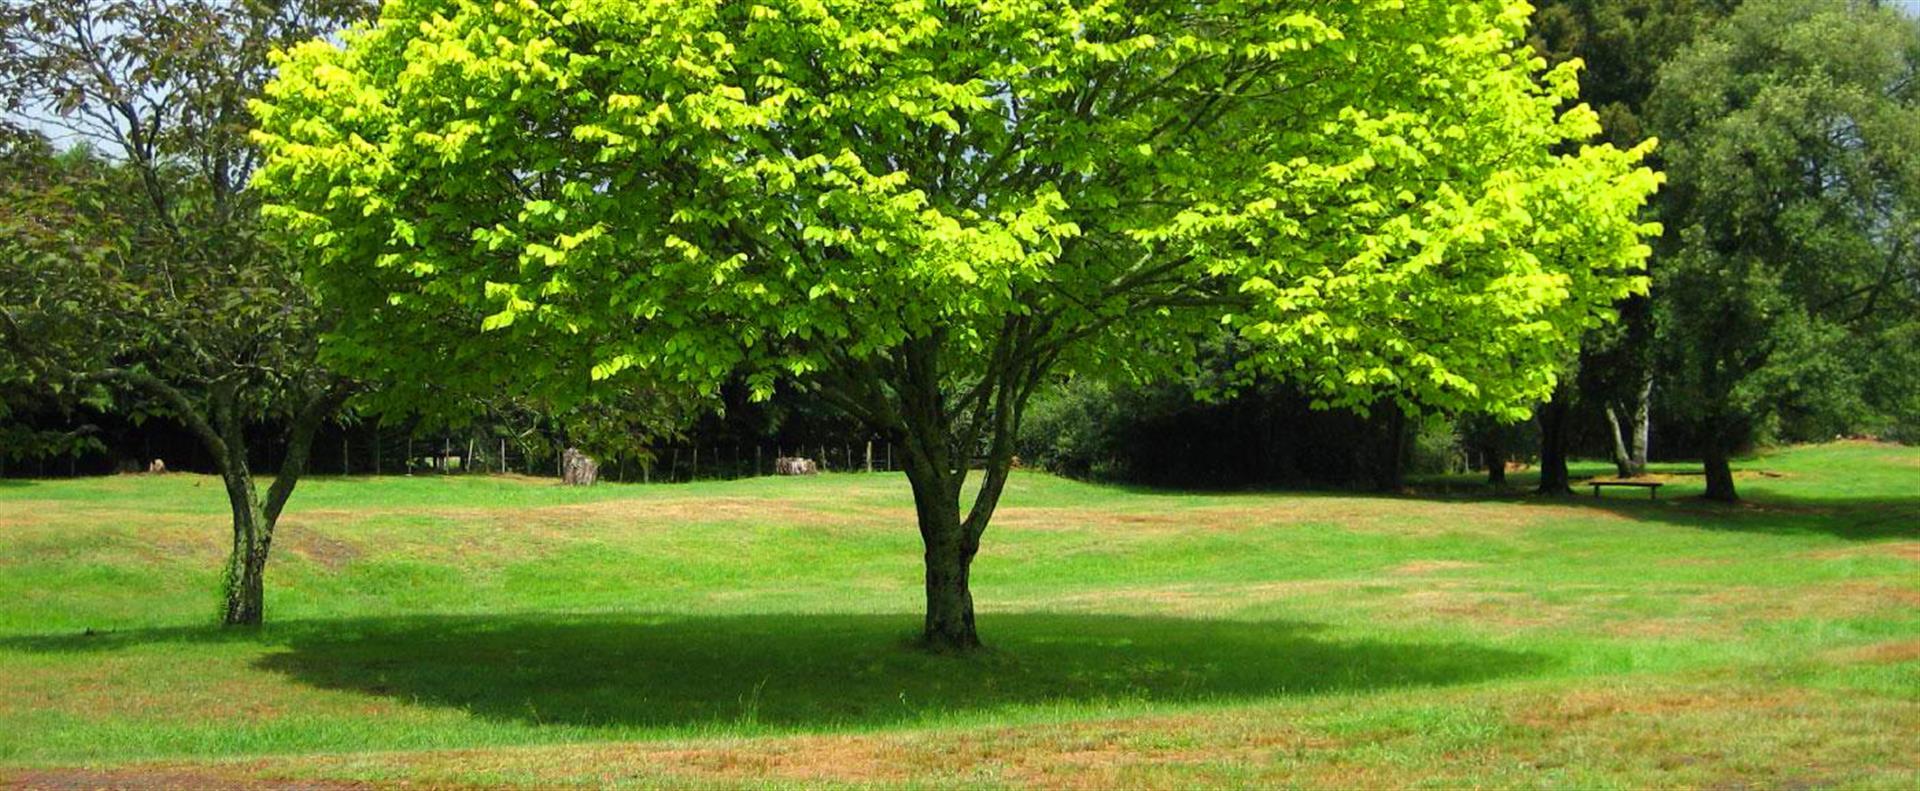 tree-health-assessment